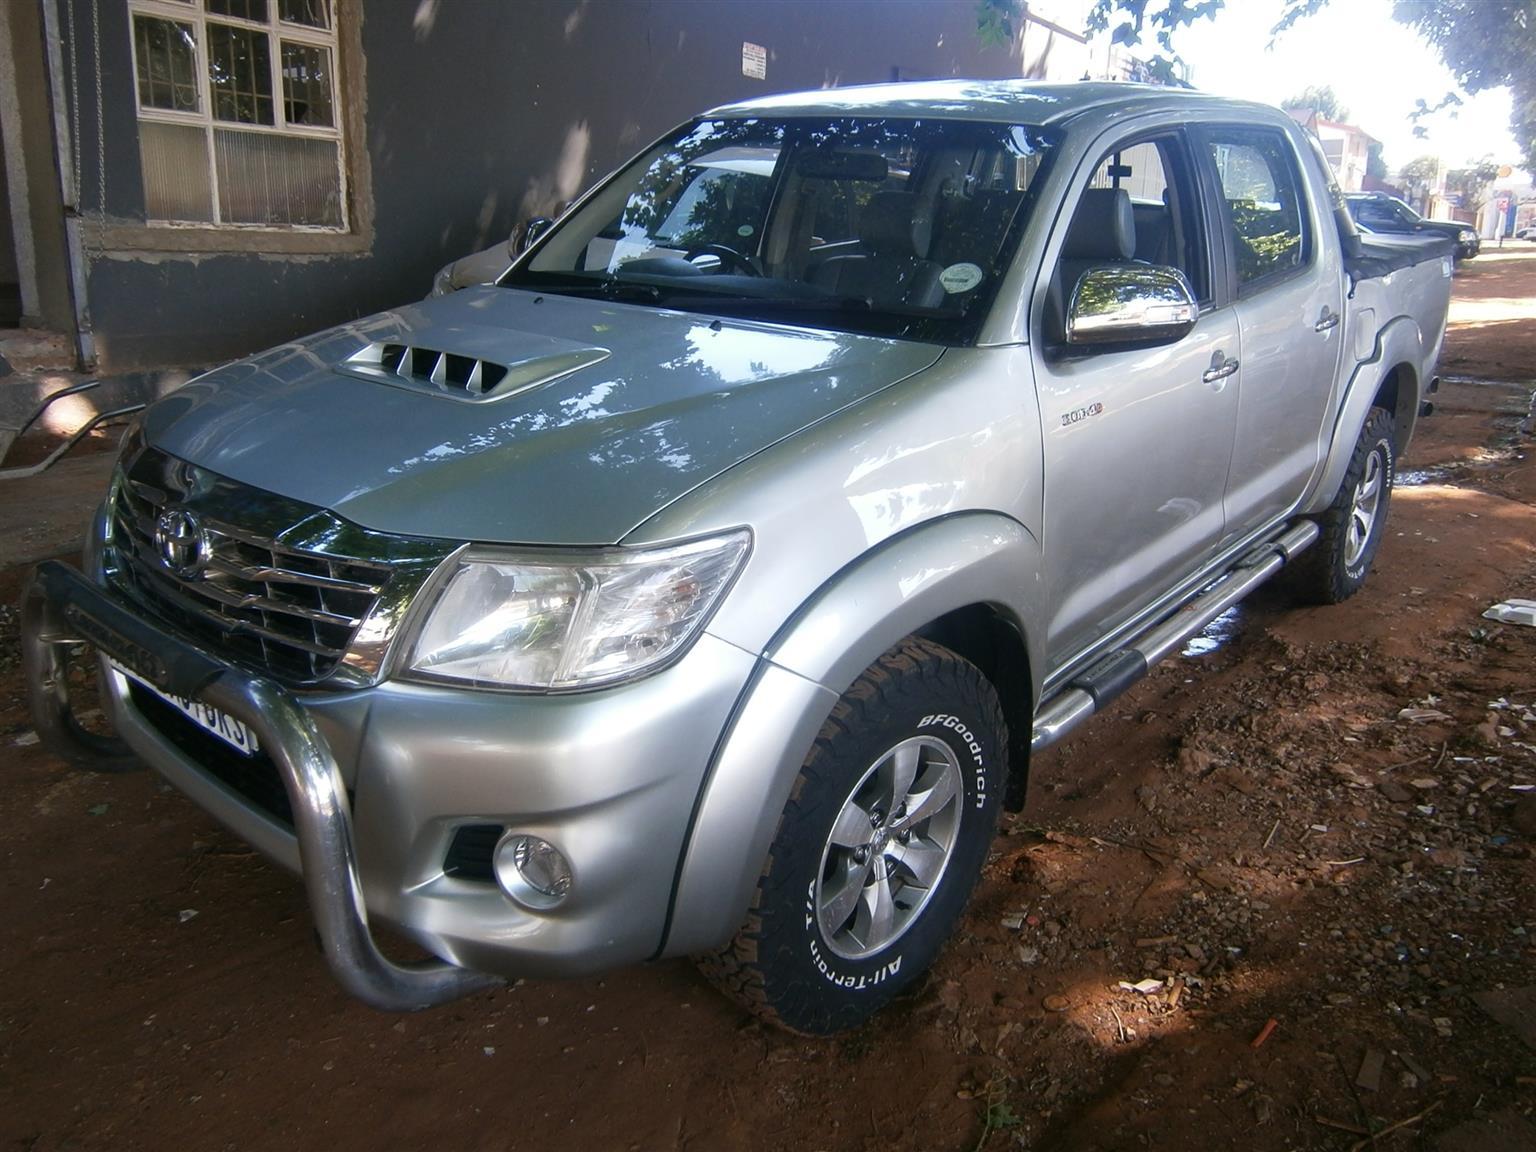 2010 Toyota Hilux 3.0D 4D 4x4 Raider Legend 40